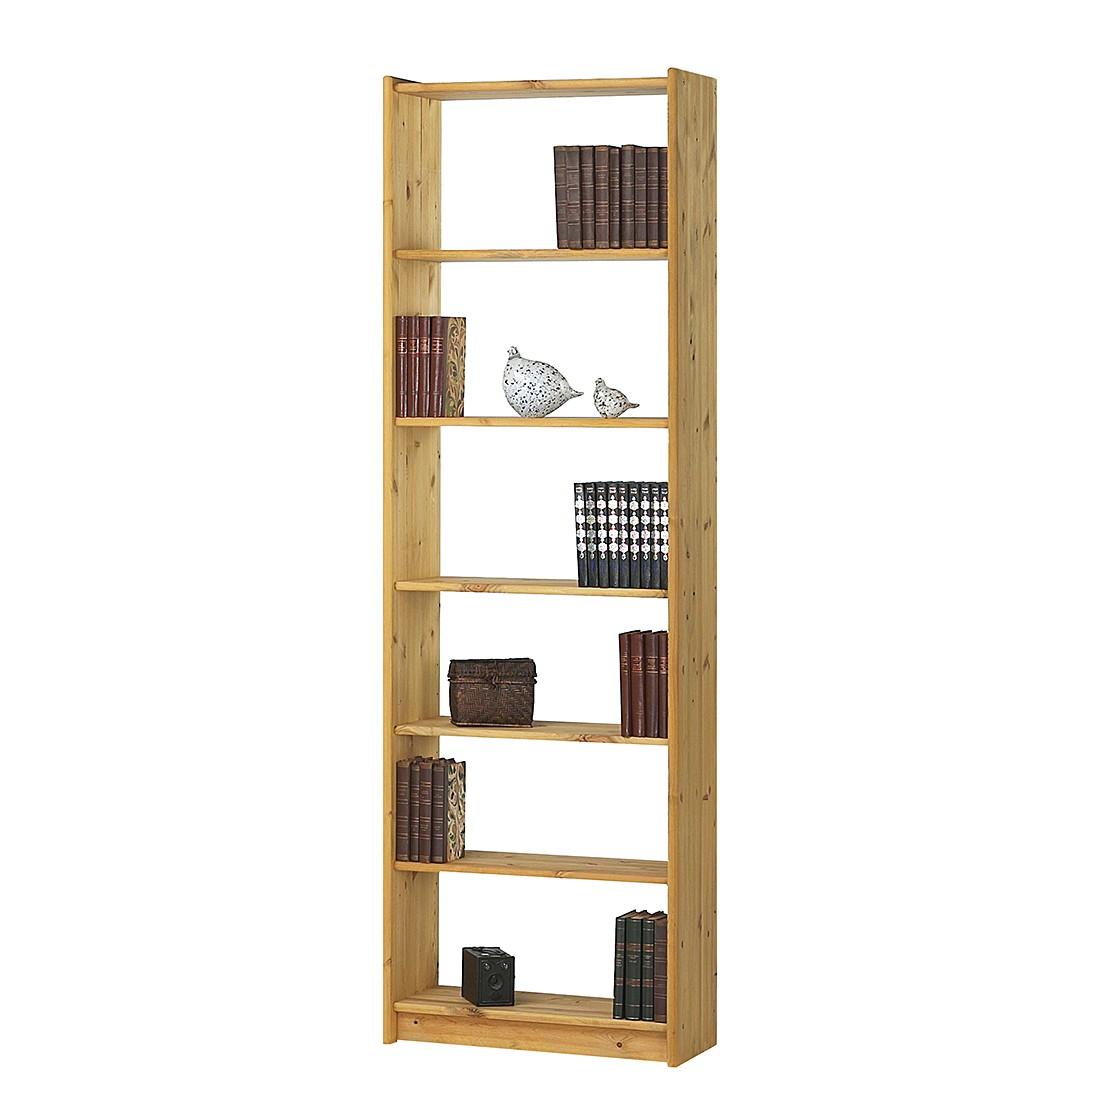 b cherregal quer m bel design idee f r sie. Black Bedroom Furniture Sets. Home Design Ideas